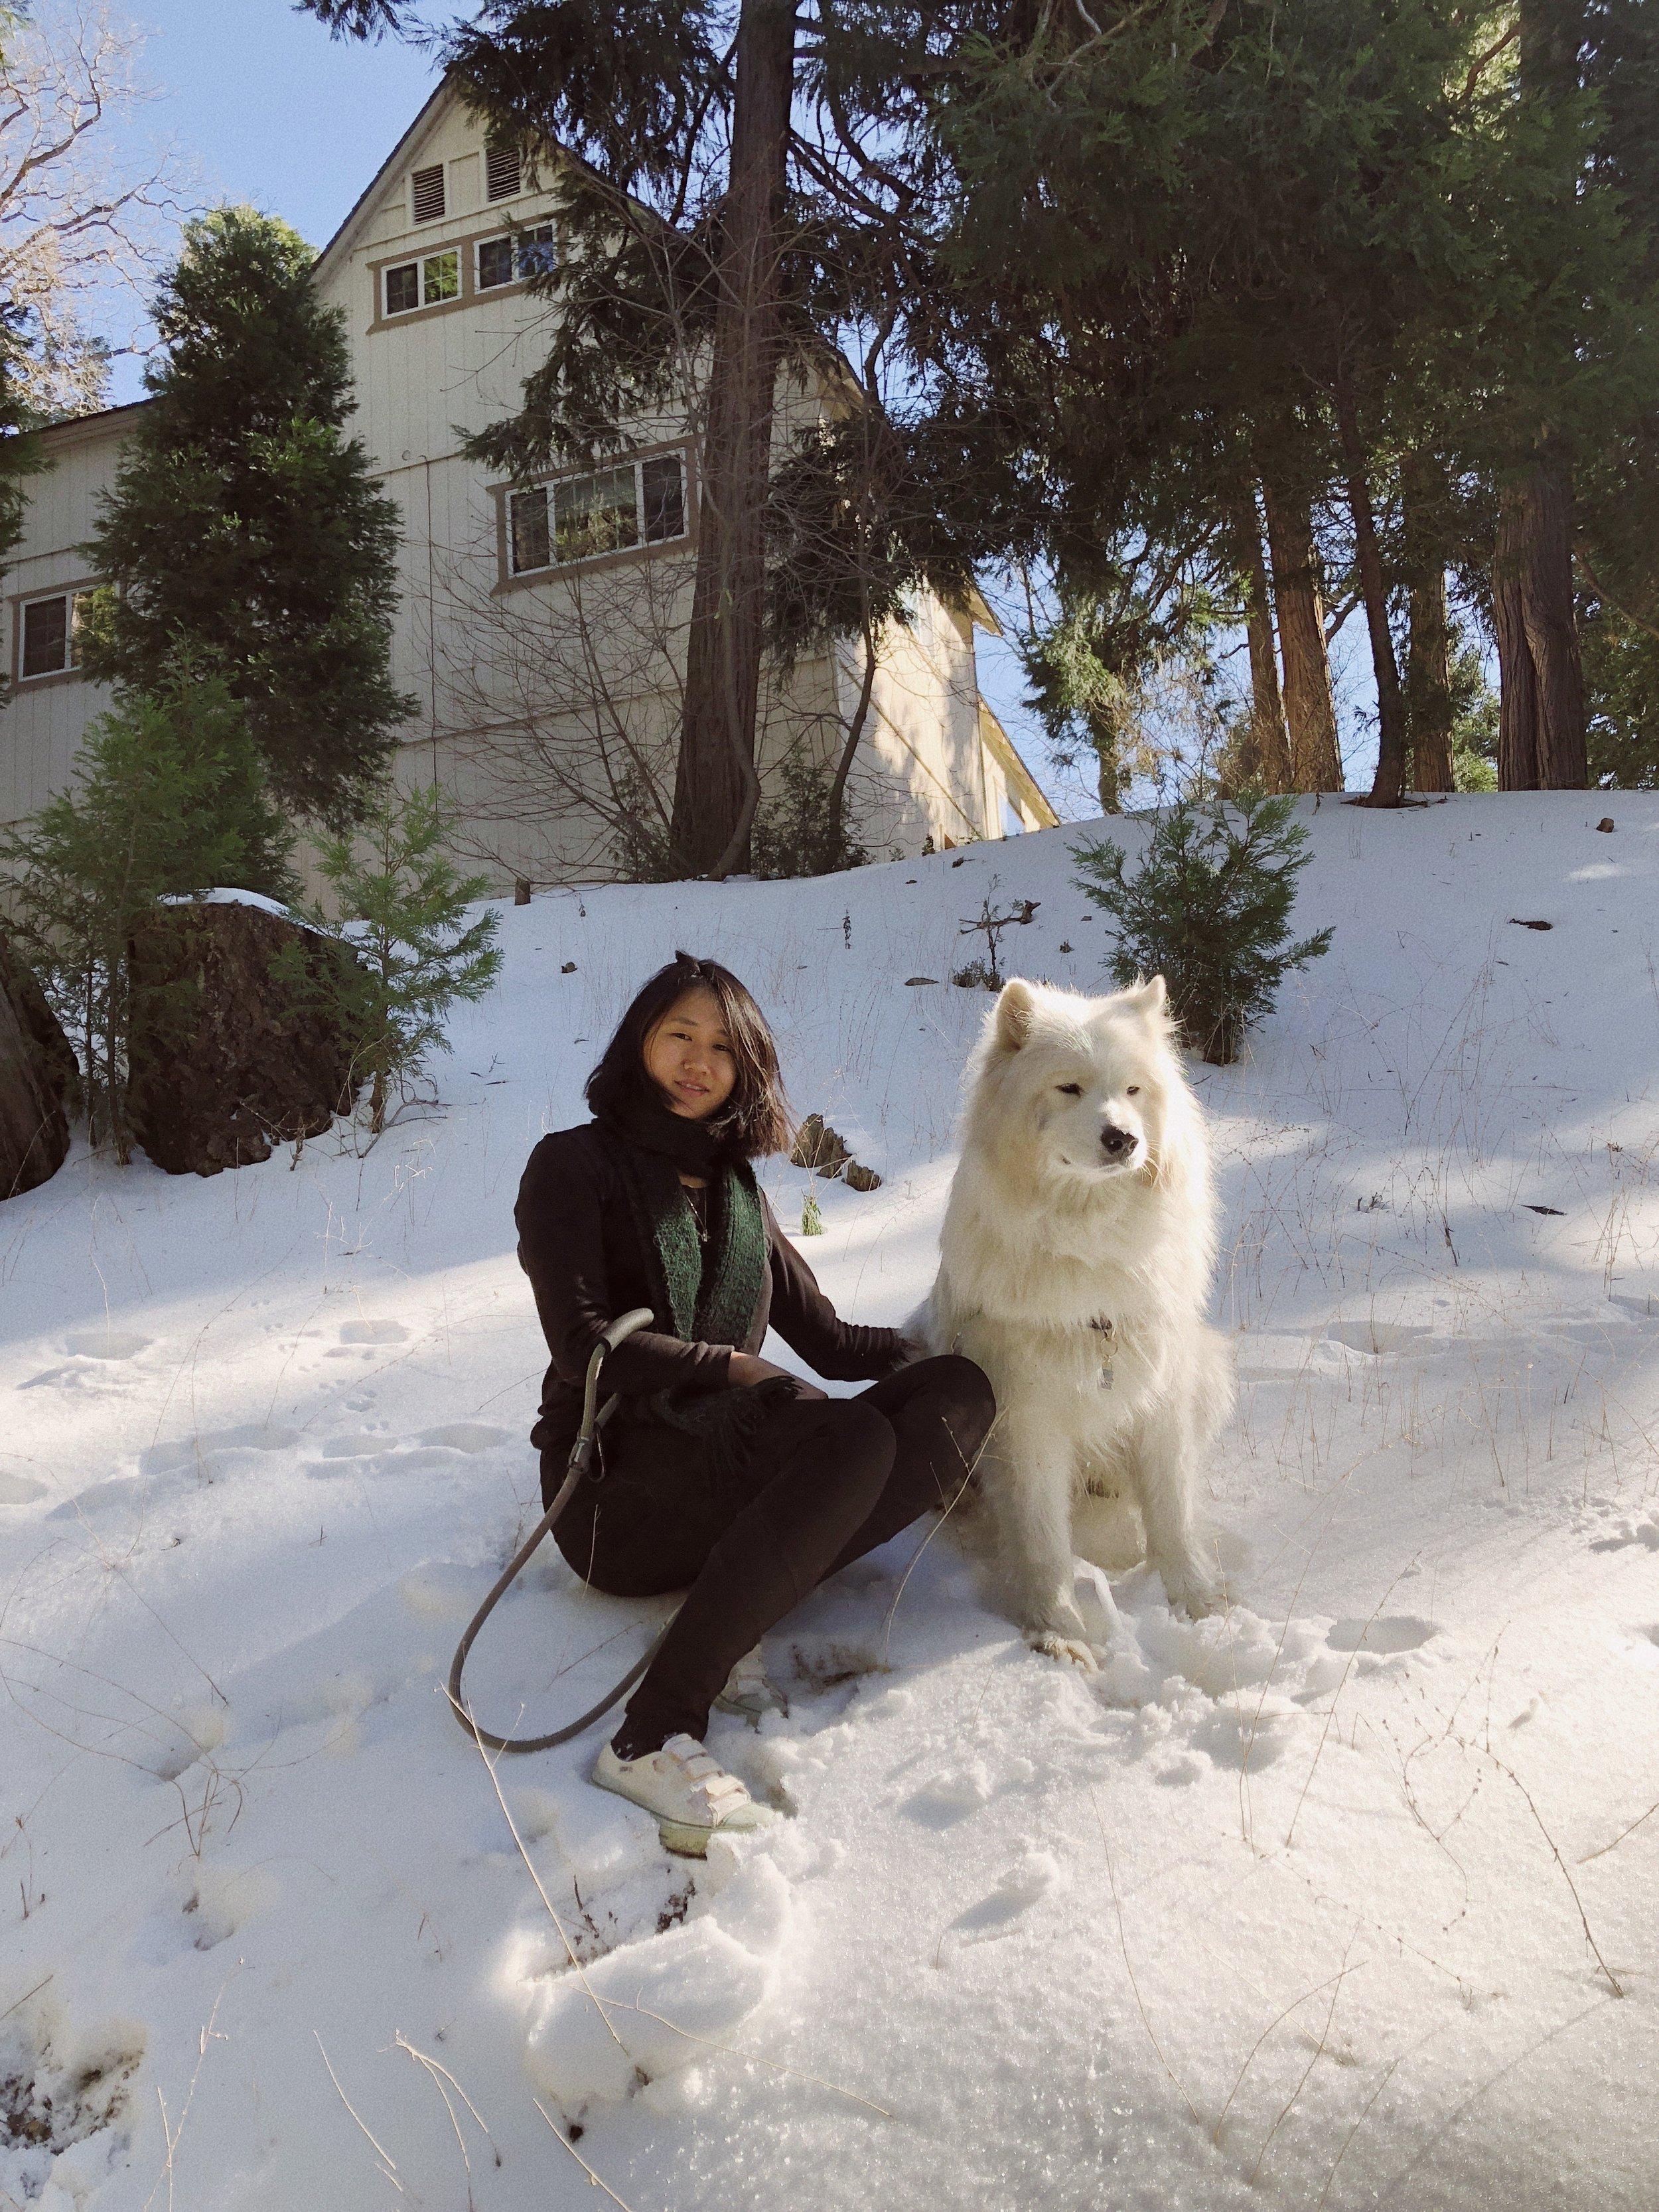 02.28.18_Lake Arrowhead_Samoyed Sumo_Ali Heiss_21.JPG